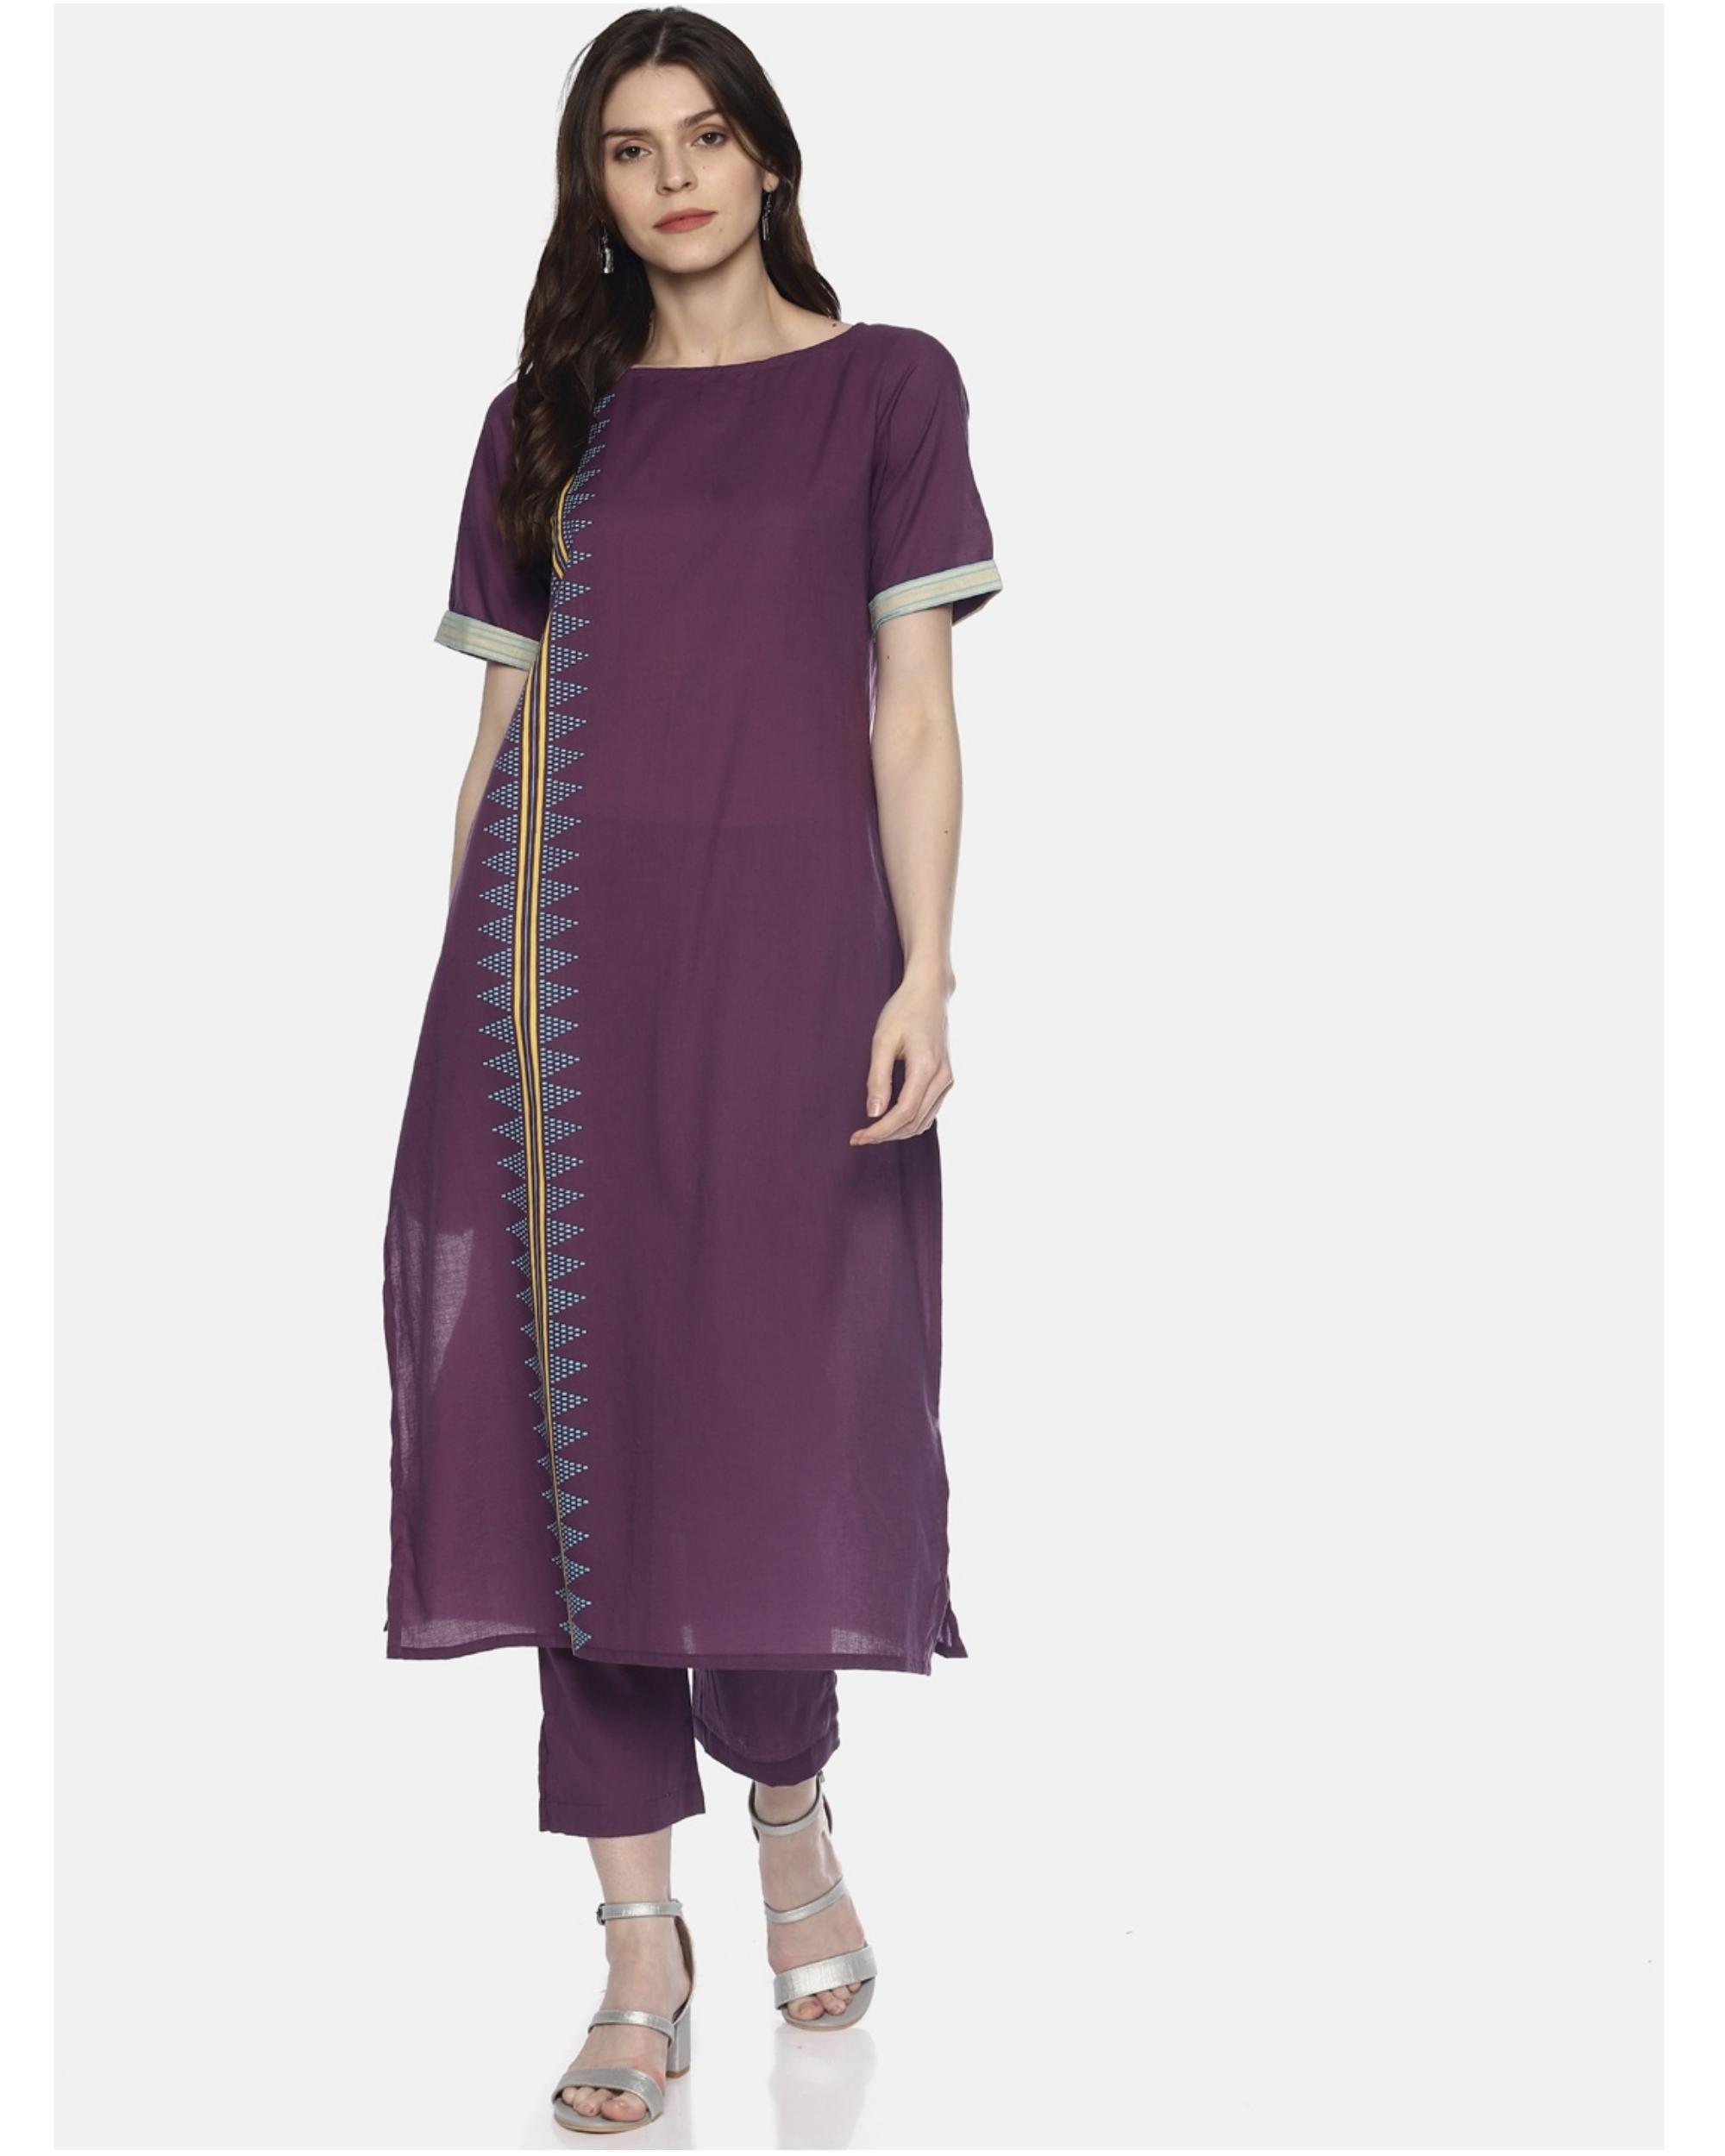 Purple printed kurta